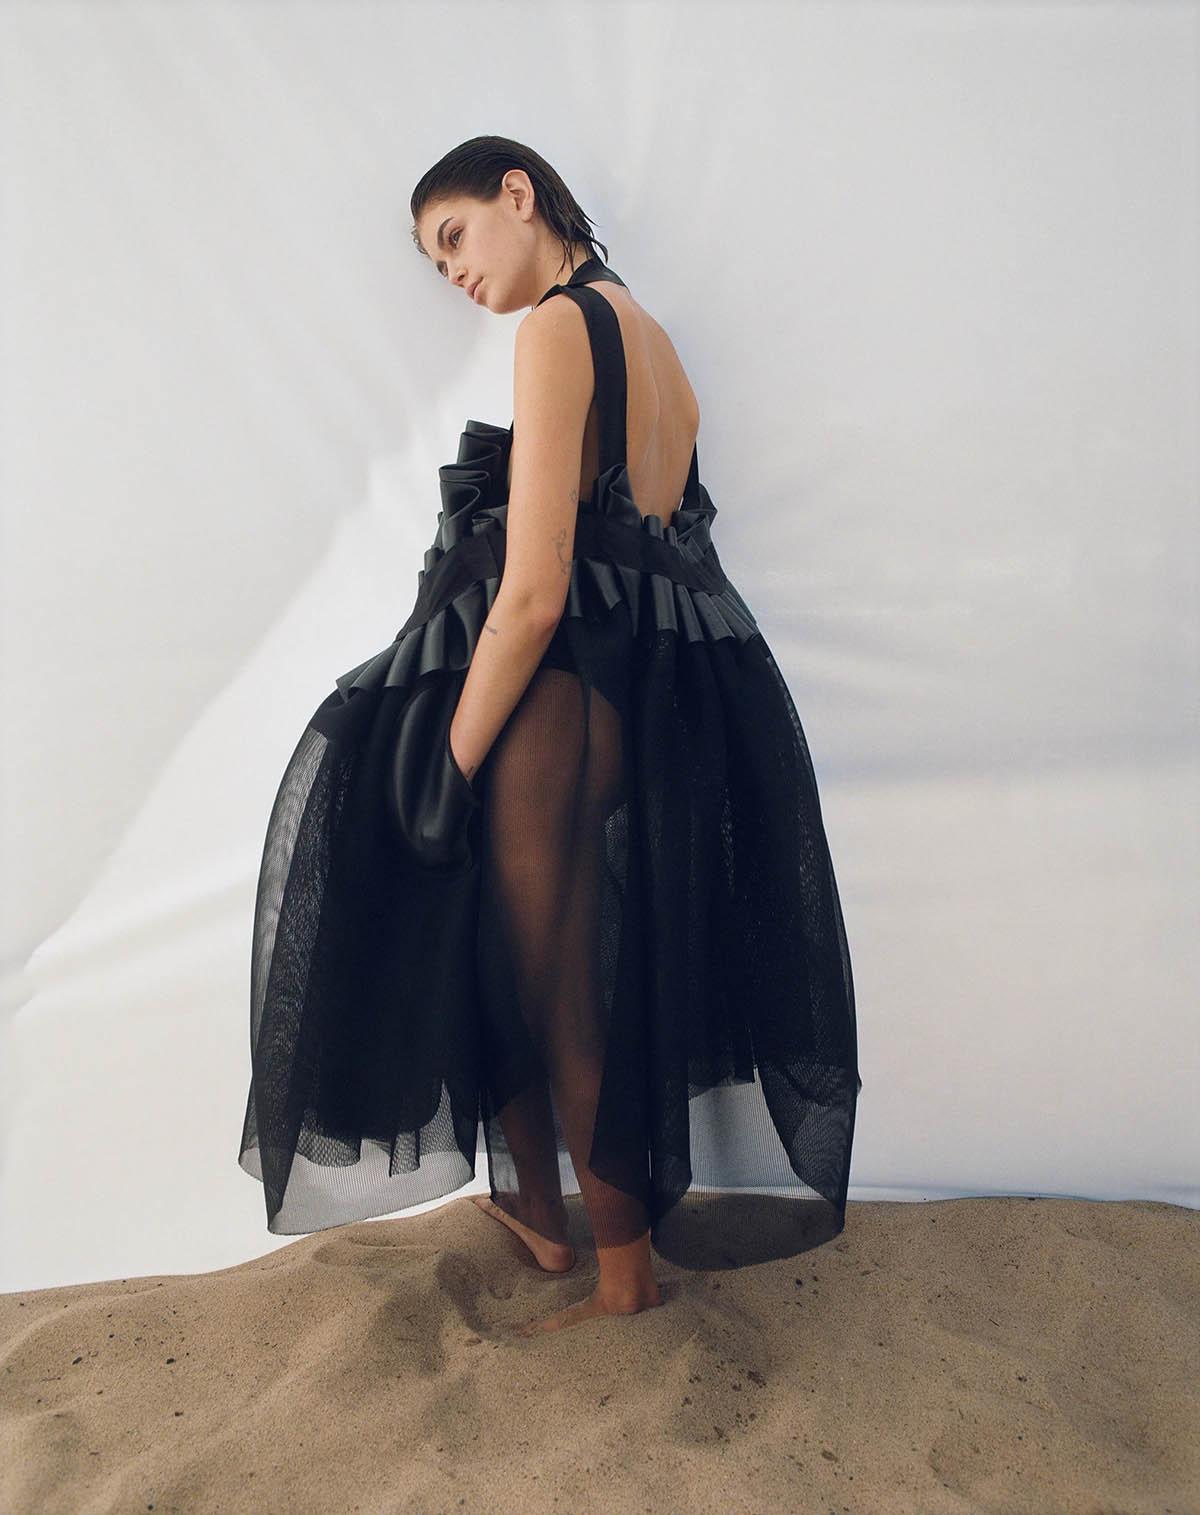 Kaia Gerber covers i-D Magazine Issue 362 by Zoë Ghertner